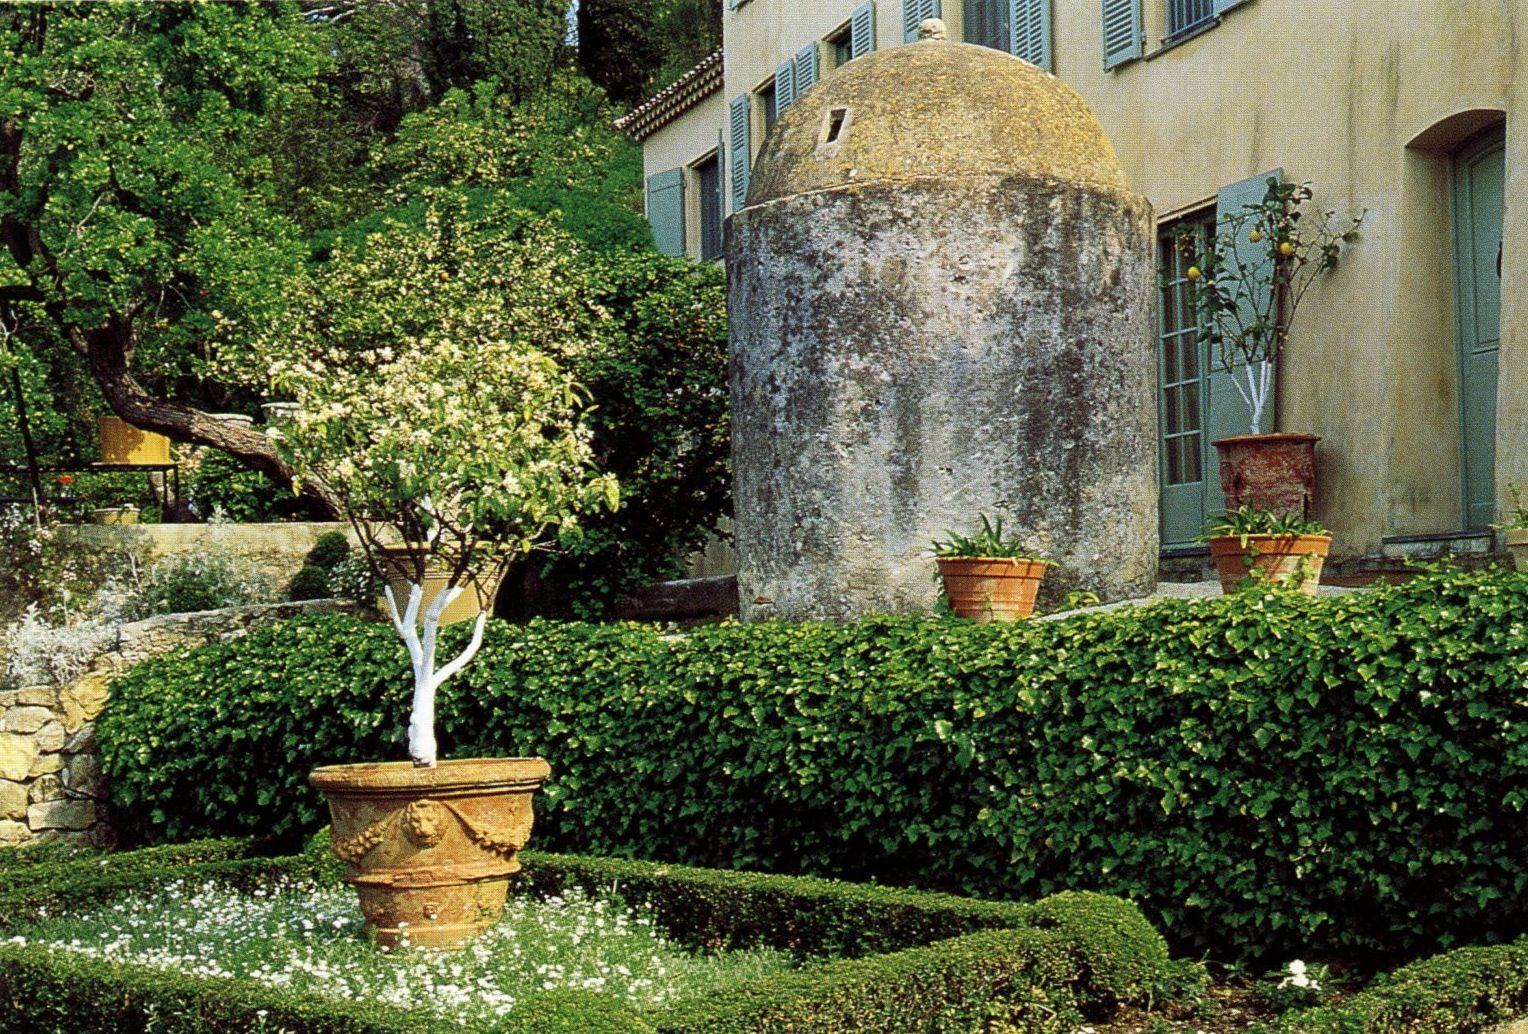 Nice garden trees  Citrus Trees surround an Ancient Tower   GARDEN  COURTYARD